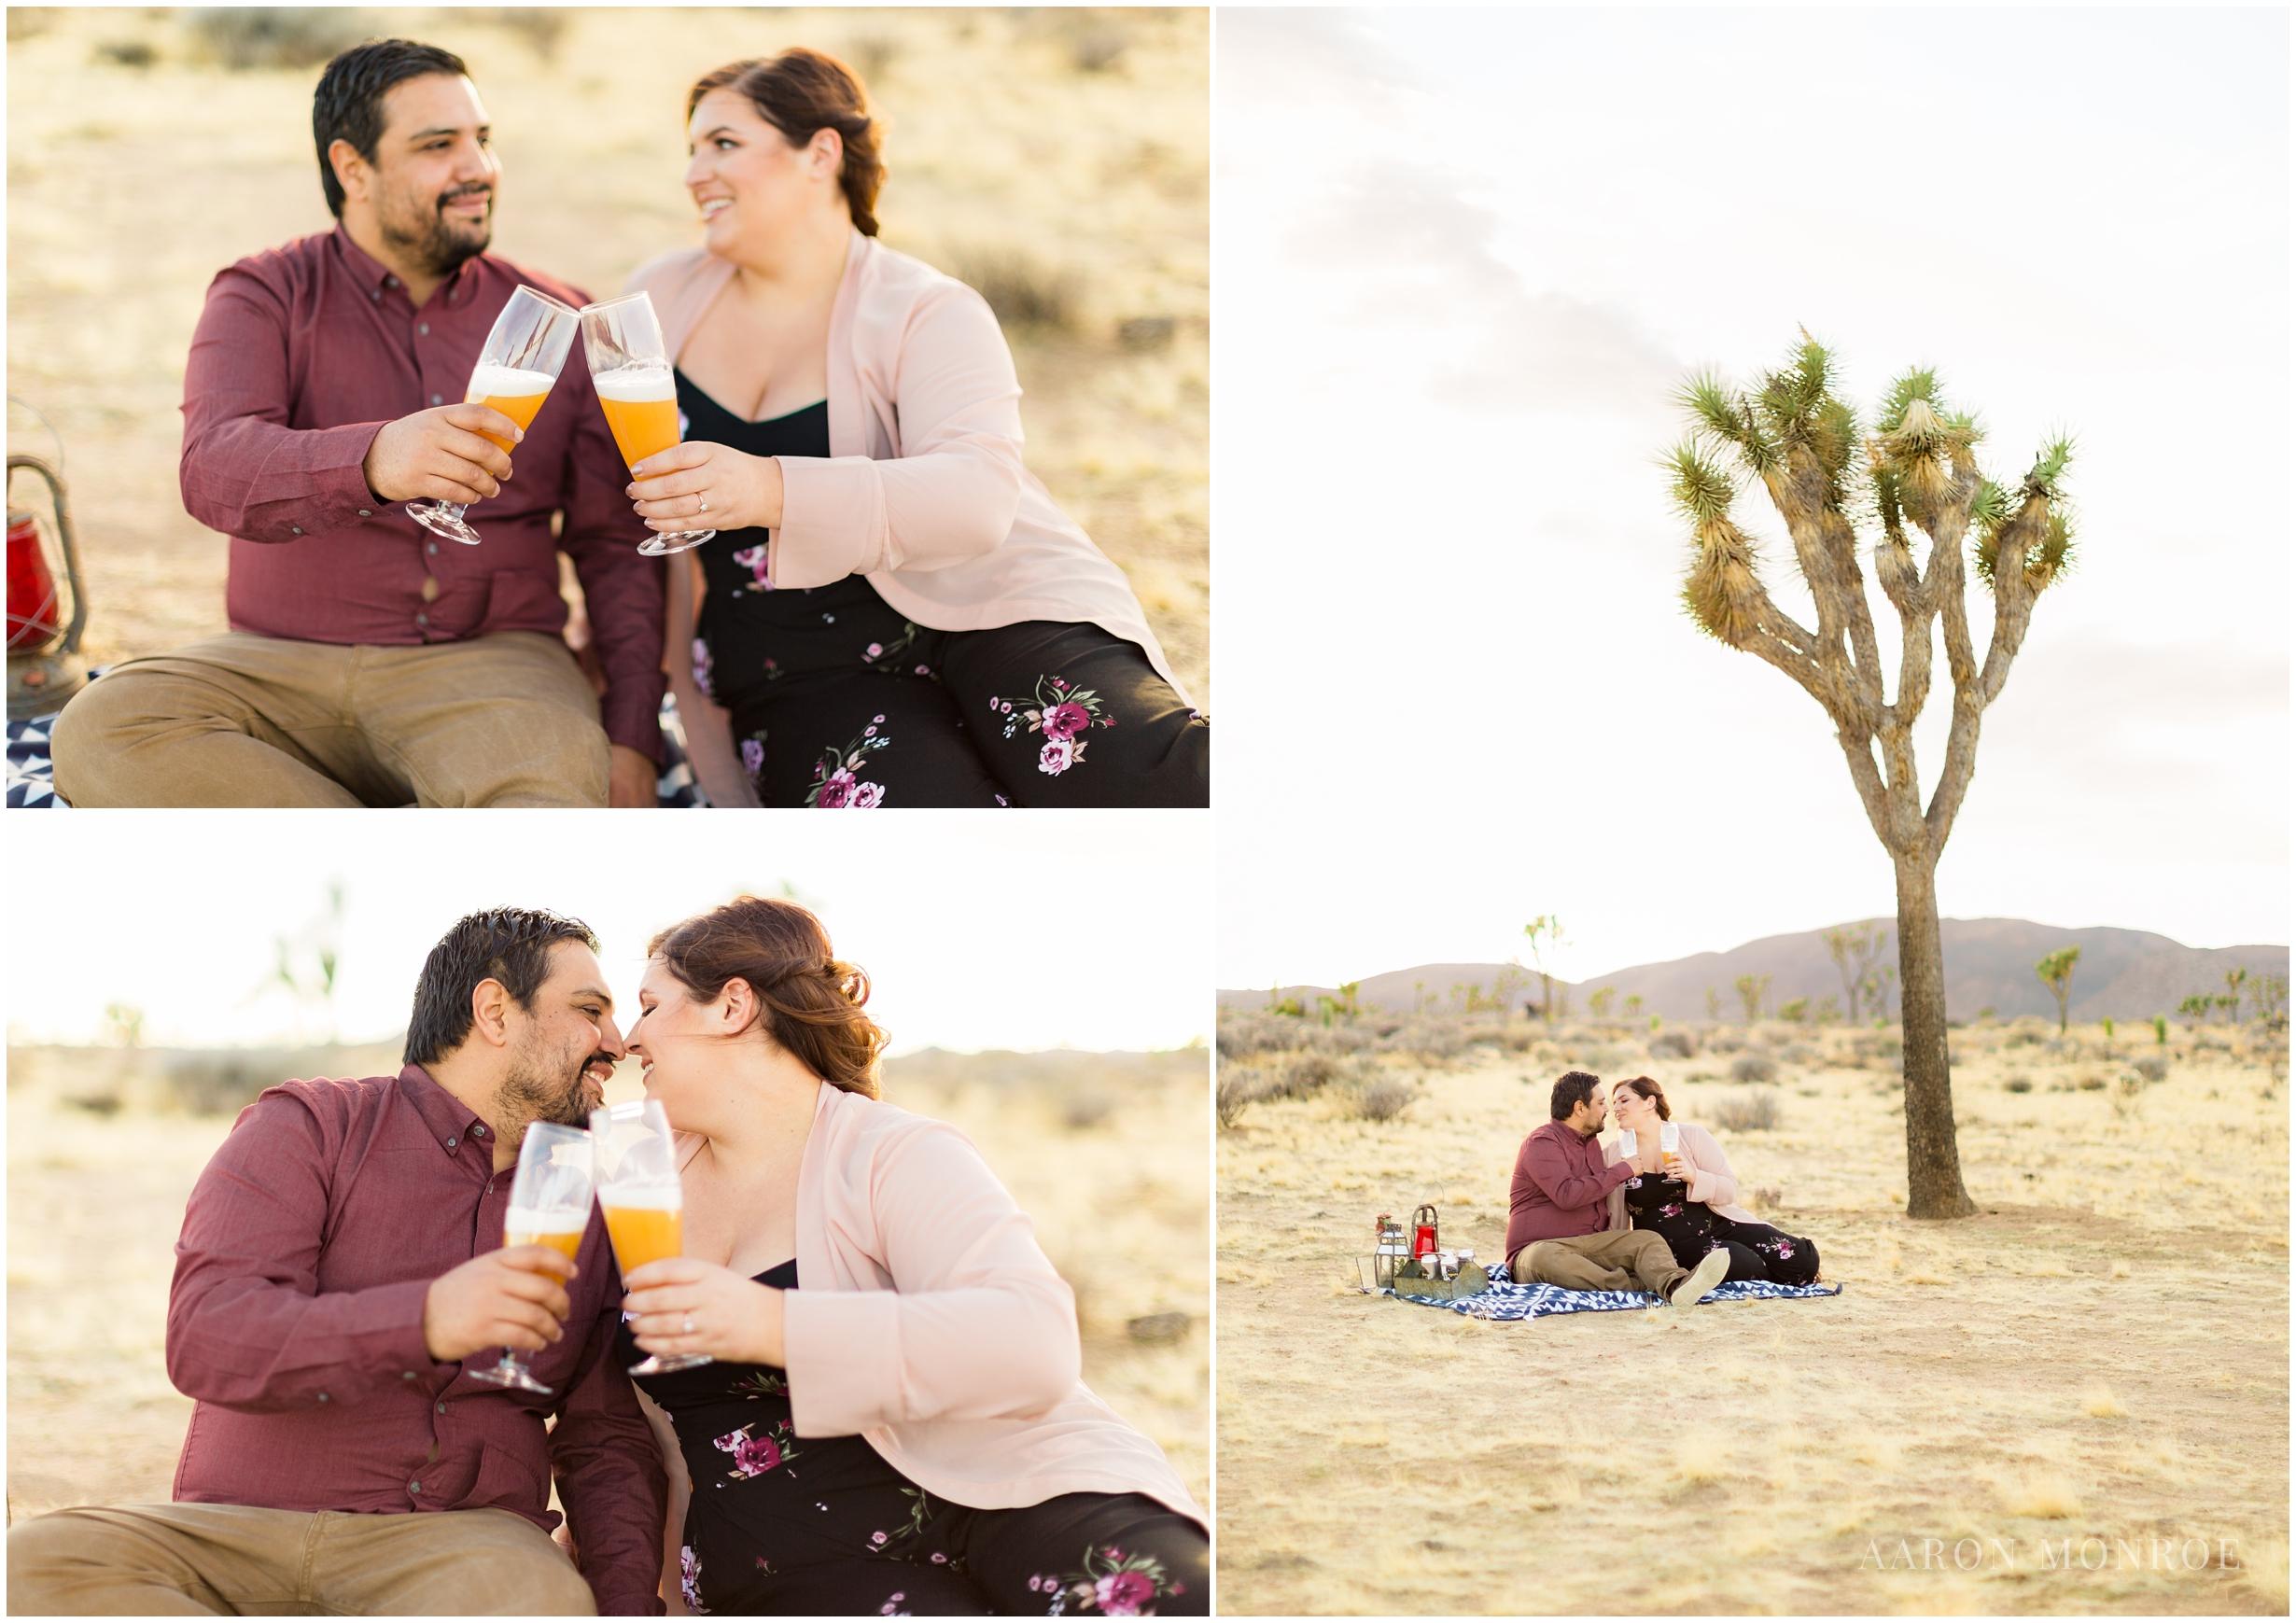 Joshua_Tree_Engagement_Los_Angeles_Wedding_Photographer_0230.jpg